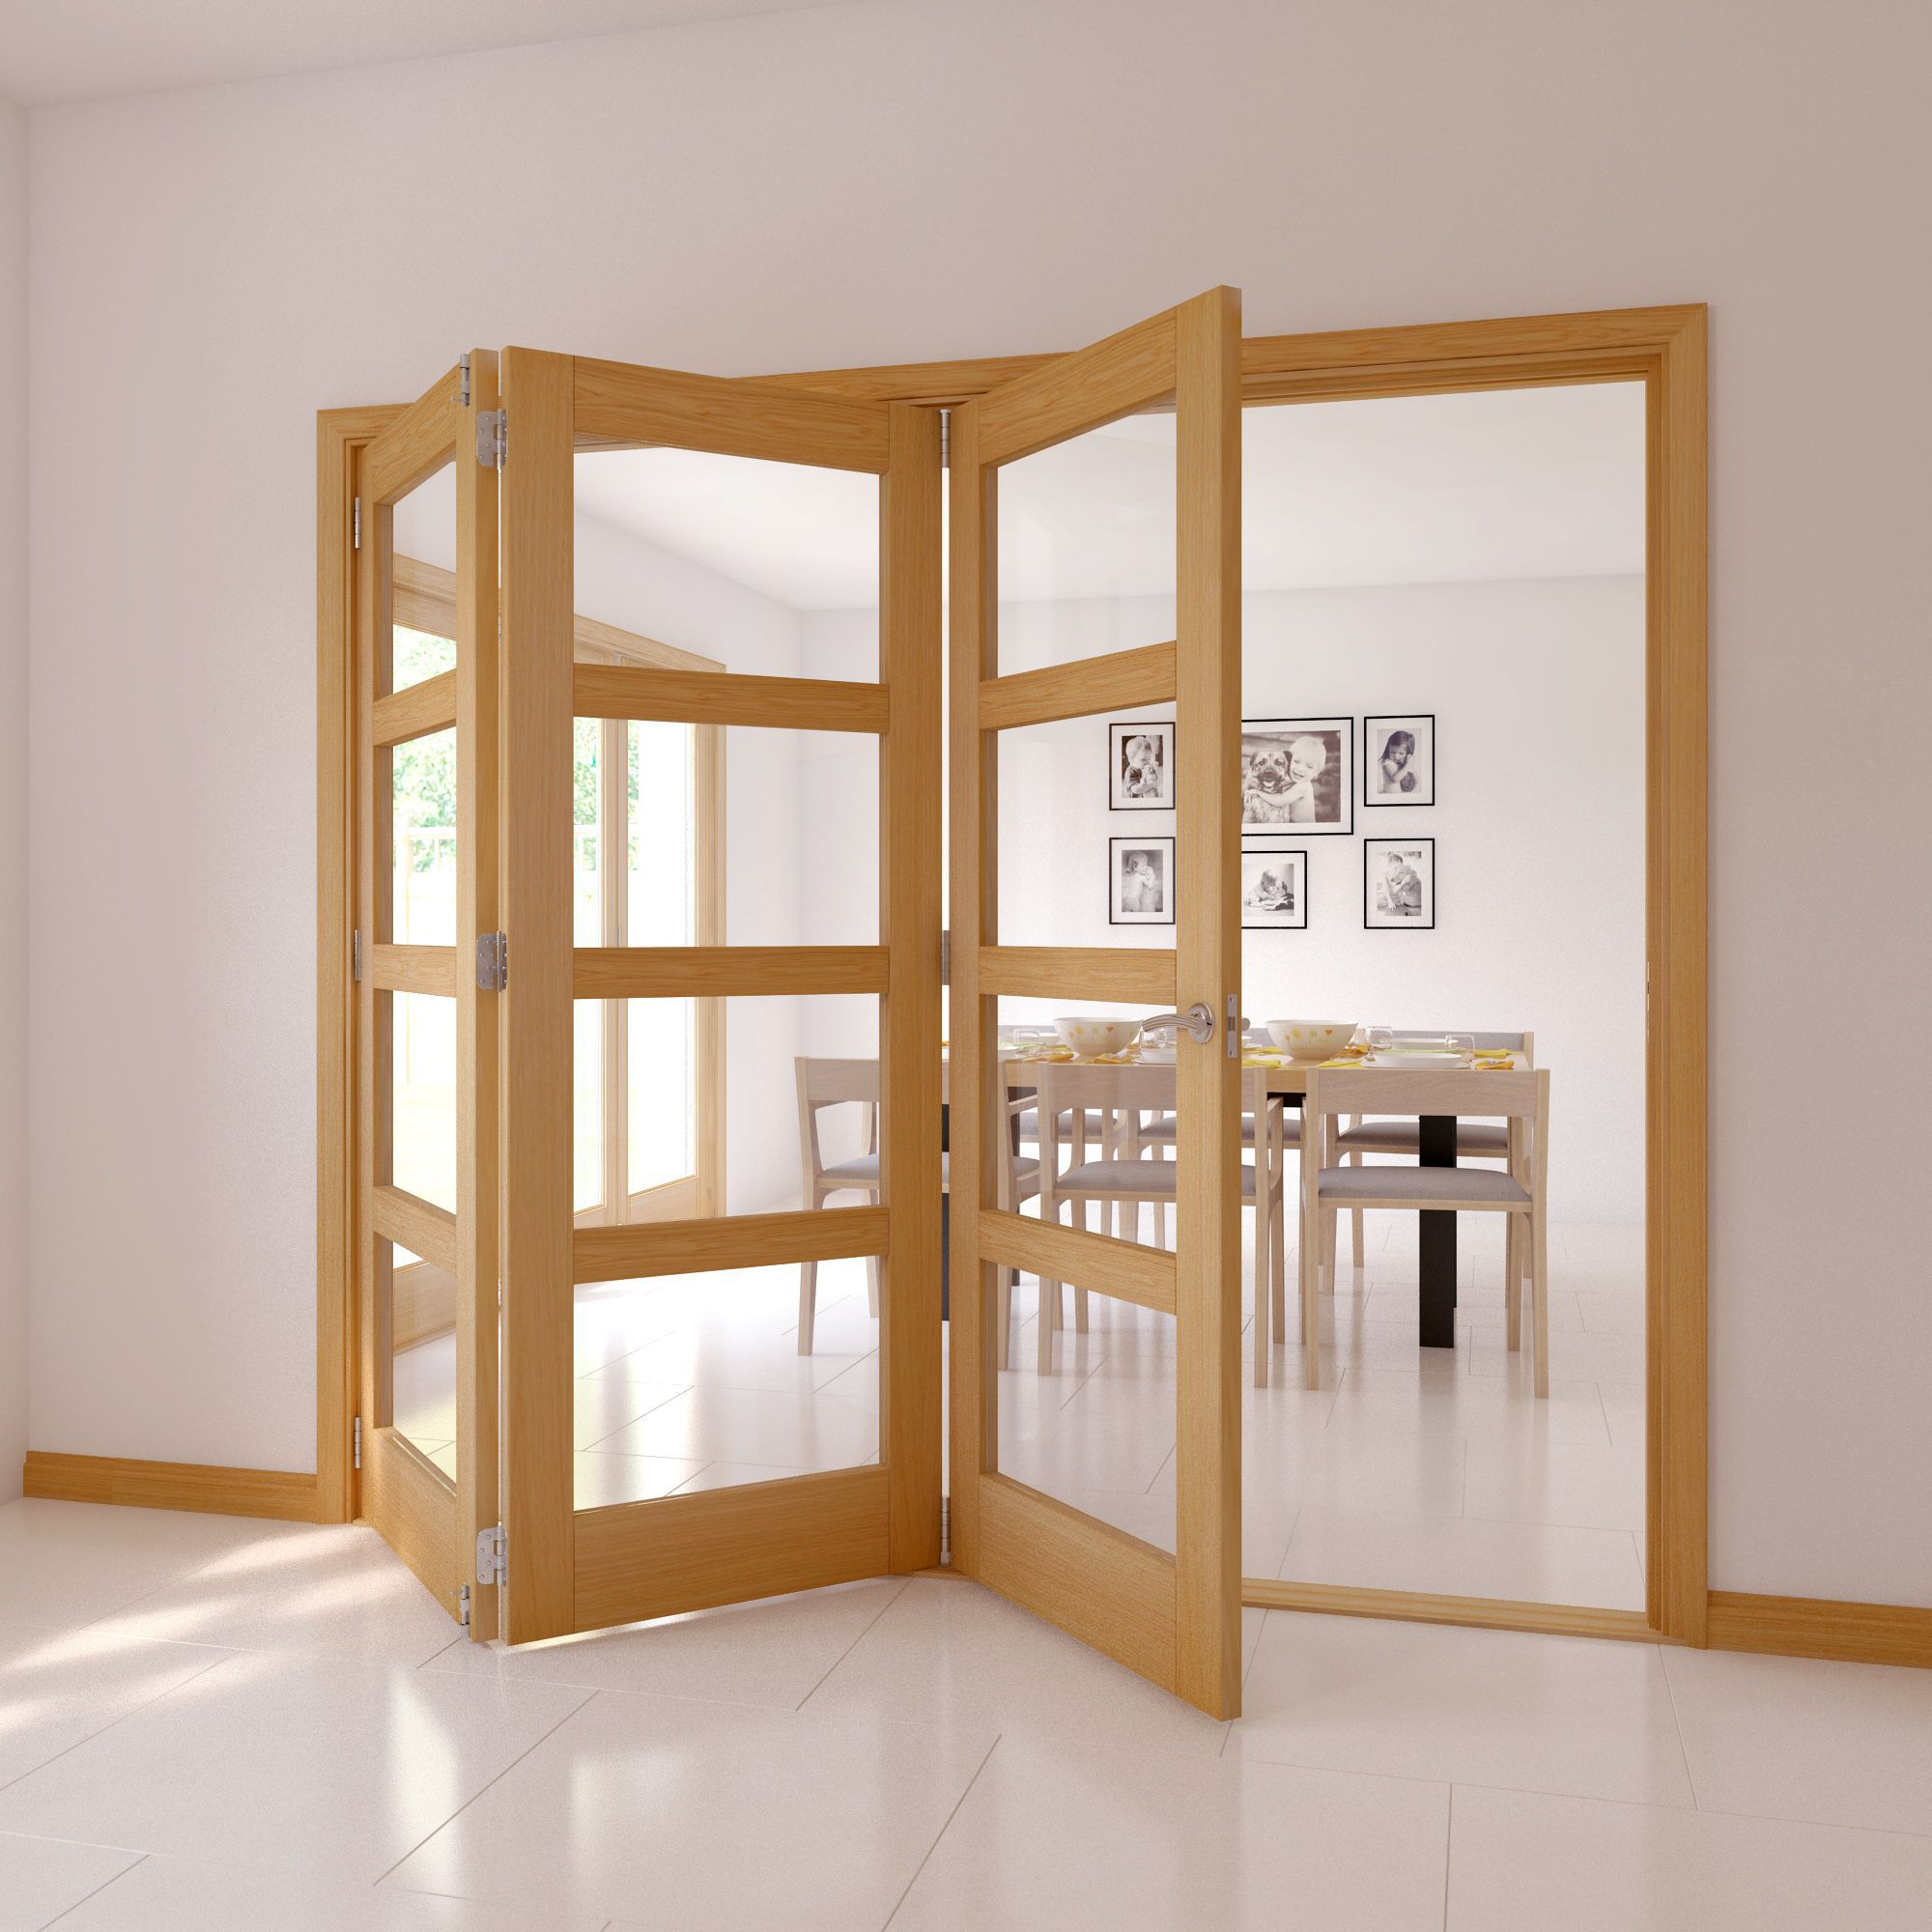 Bi fold glazed door diy 4 panel 4 lite oak veneer glazed internal folding door h2035mm eventelaan Choice Image